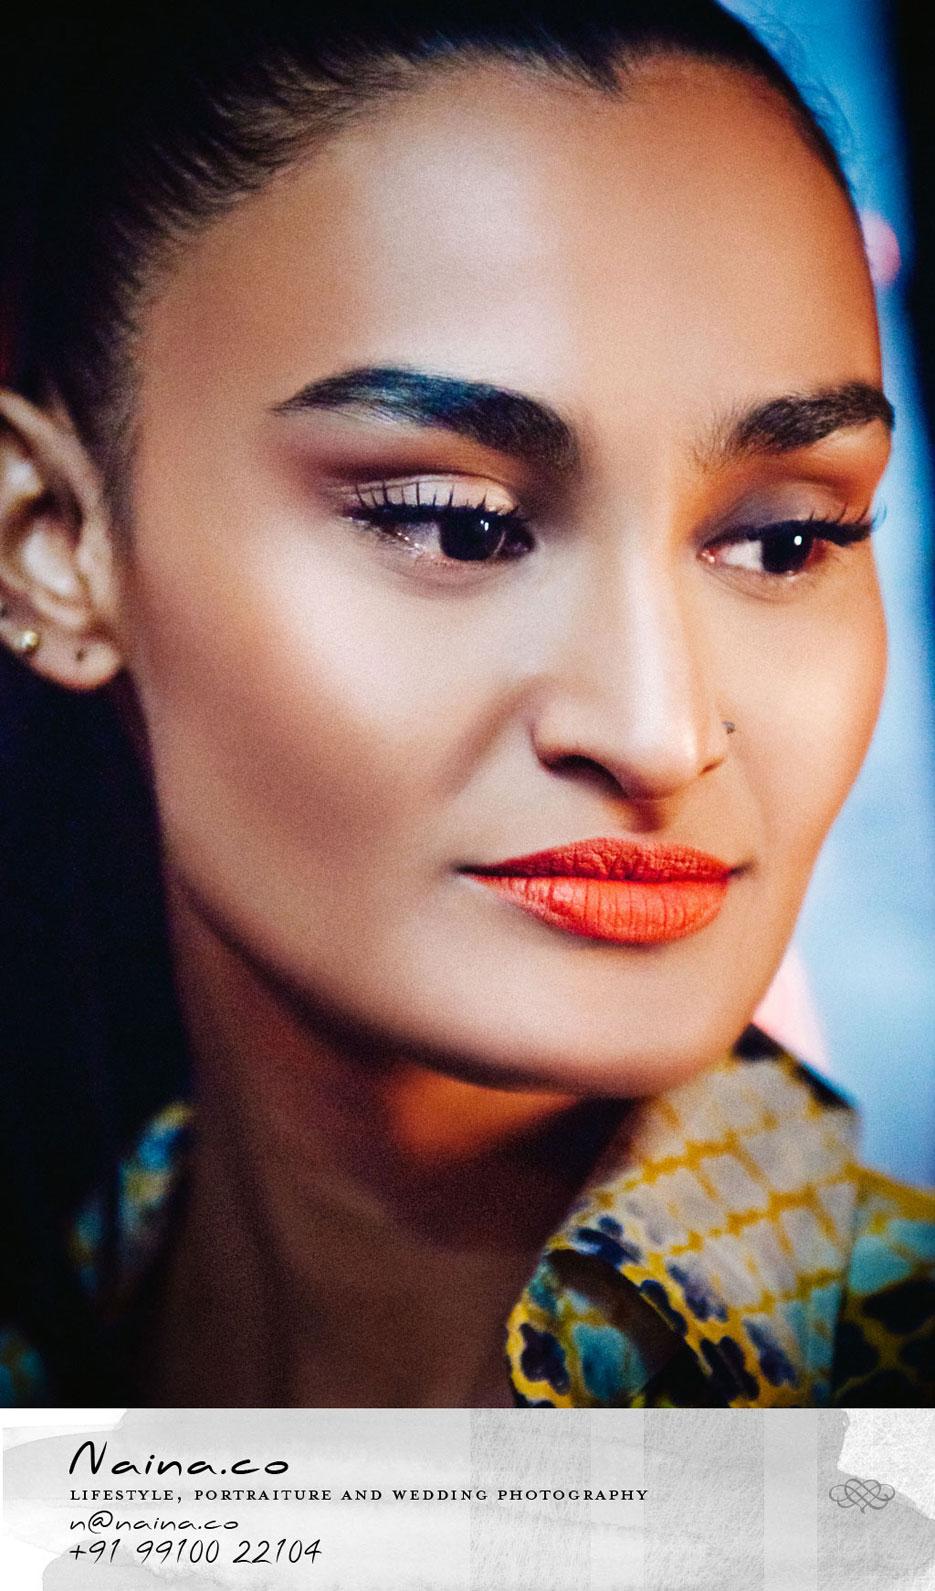 Fashion photography on the Nikon D90 for sale. Professional photographer Naina Redhu.